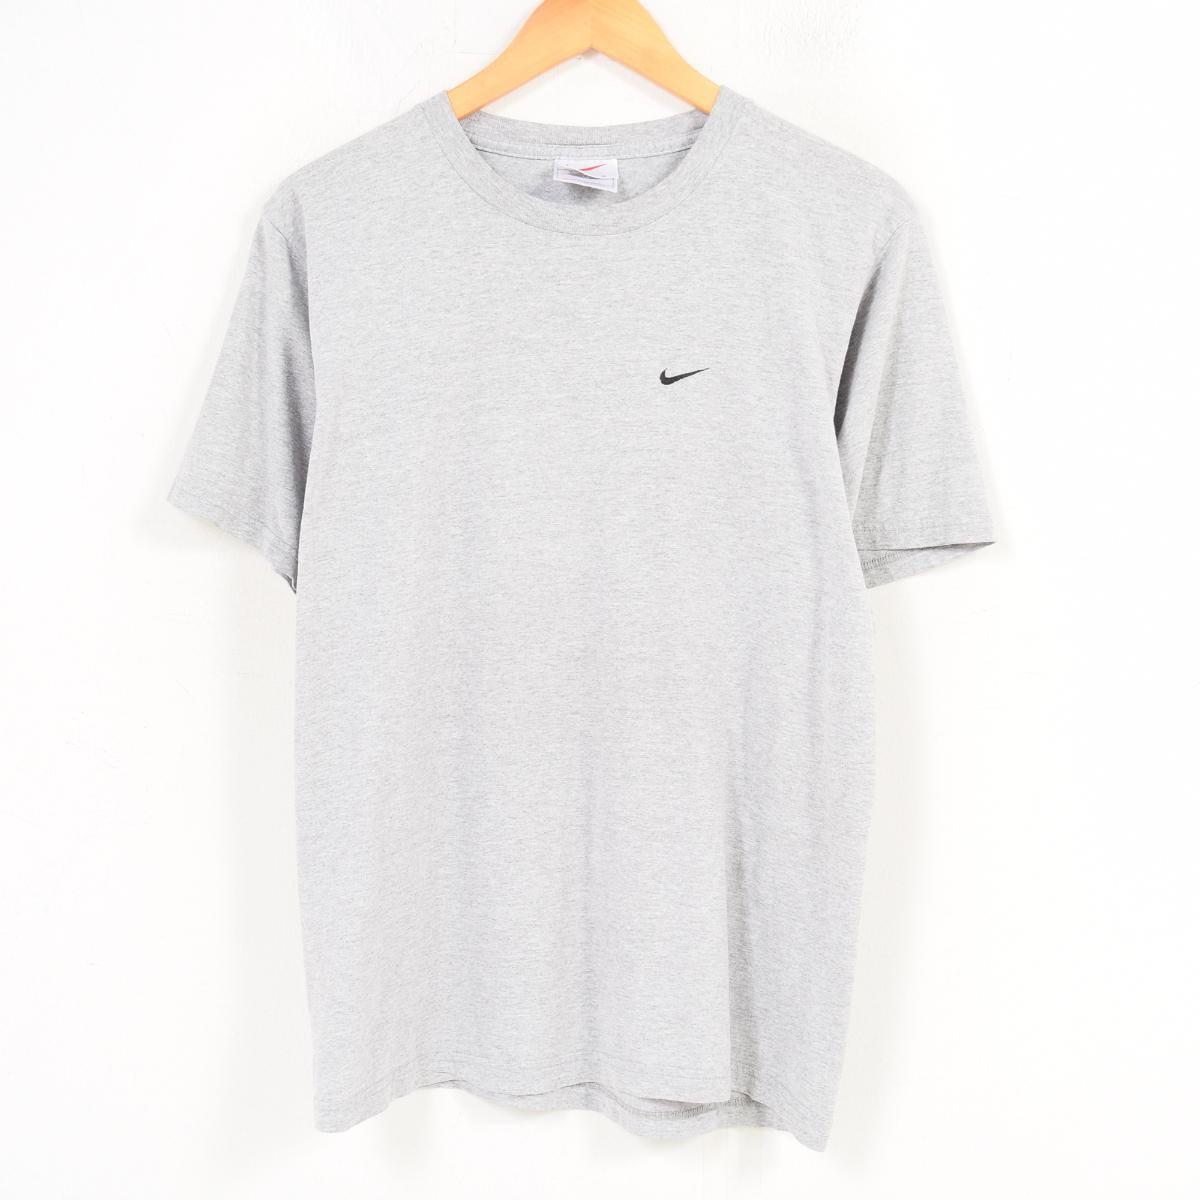 6181b966 VINTAGE CLOTHING JAM: 90s Nike NIKE one point logo T-shirt men M ...